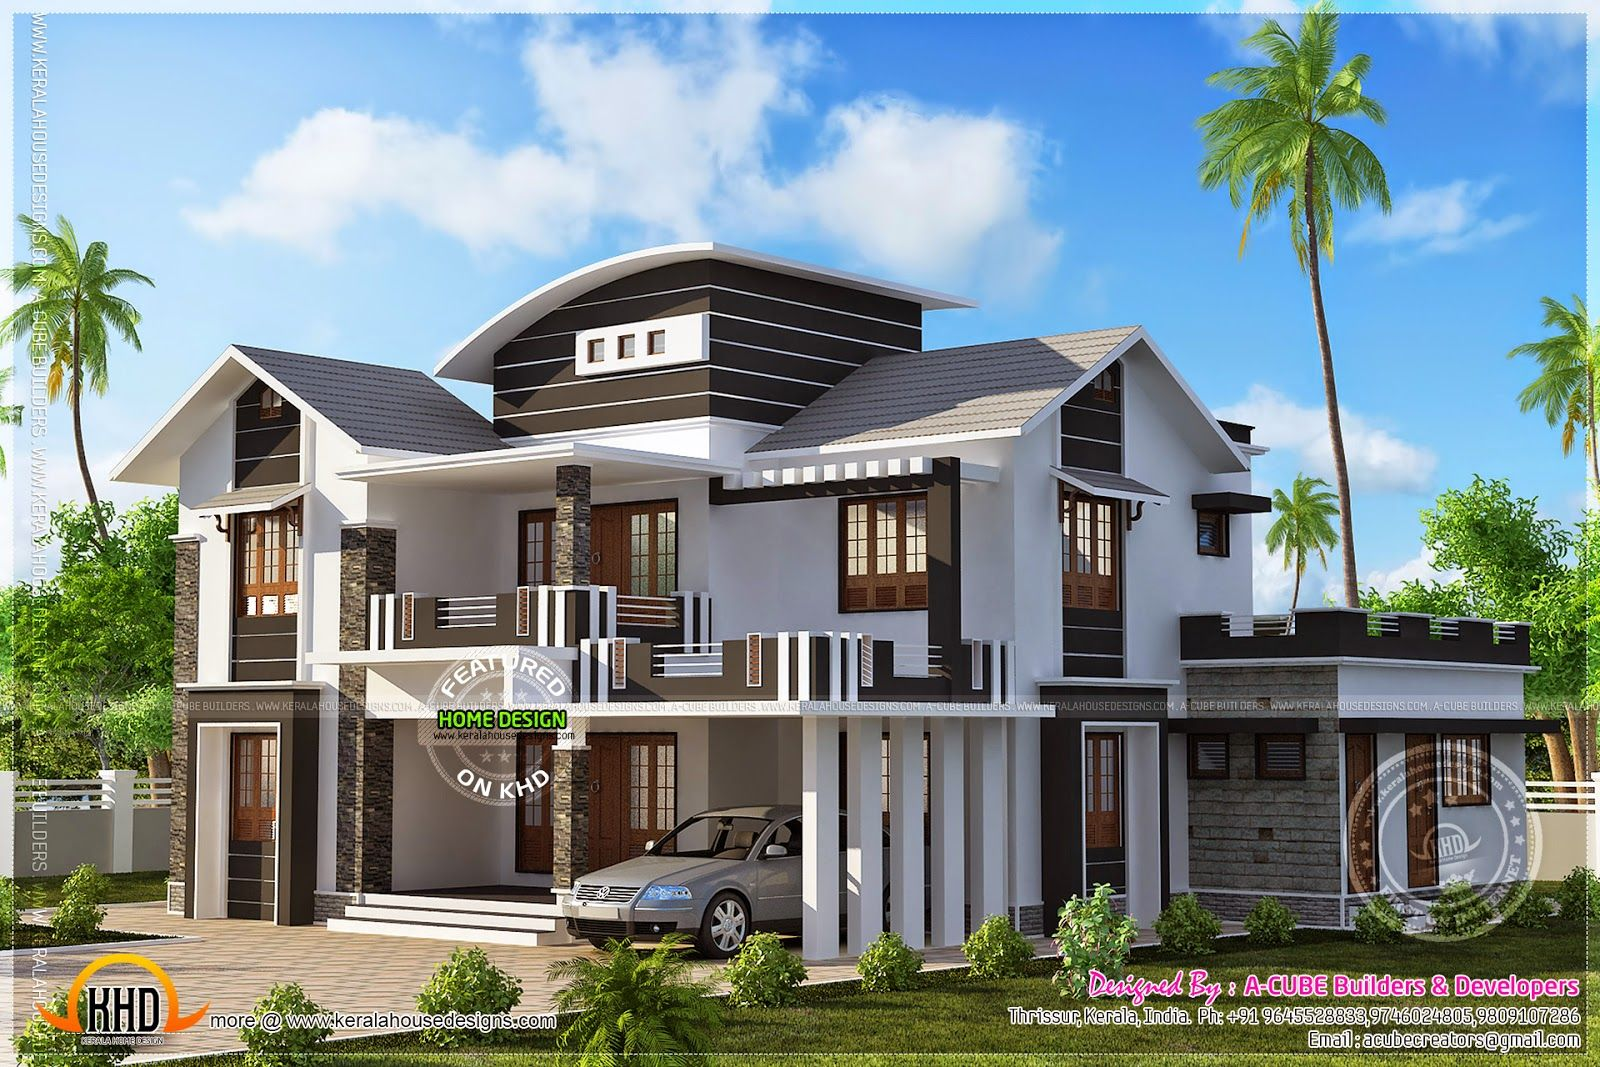 indian house parapet wall design Home Design Get Indian House Parapet Wall Design Background